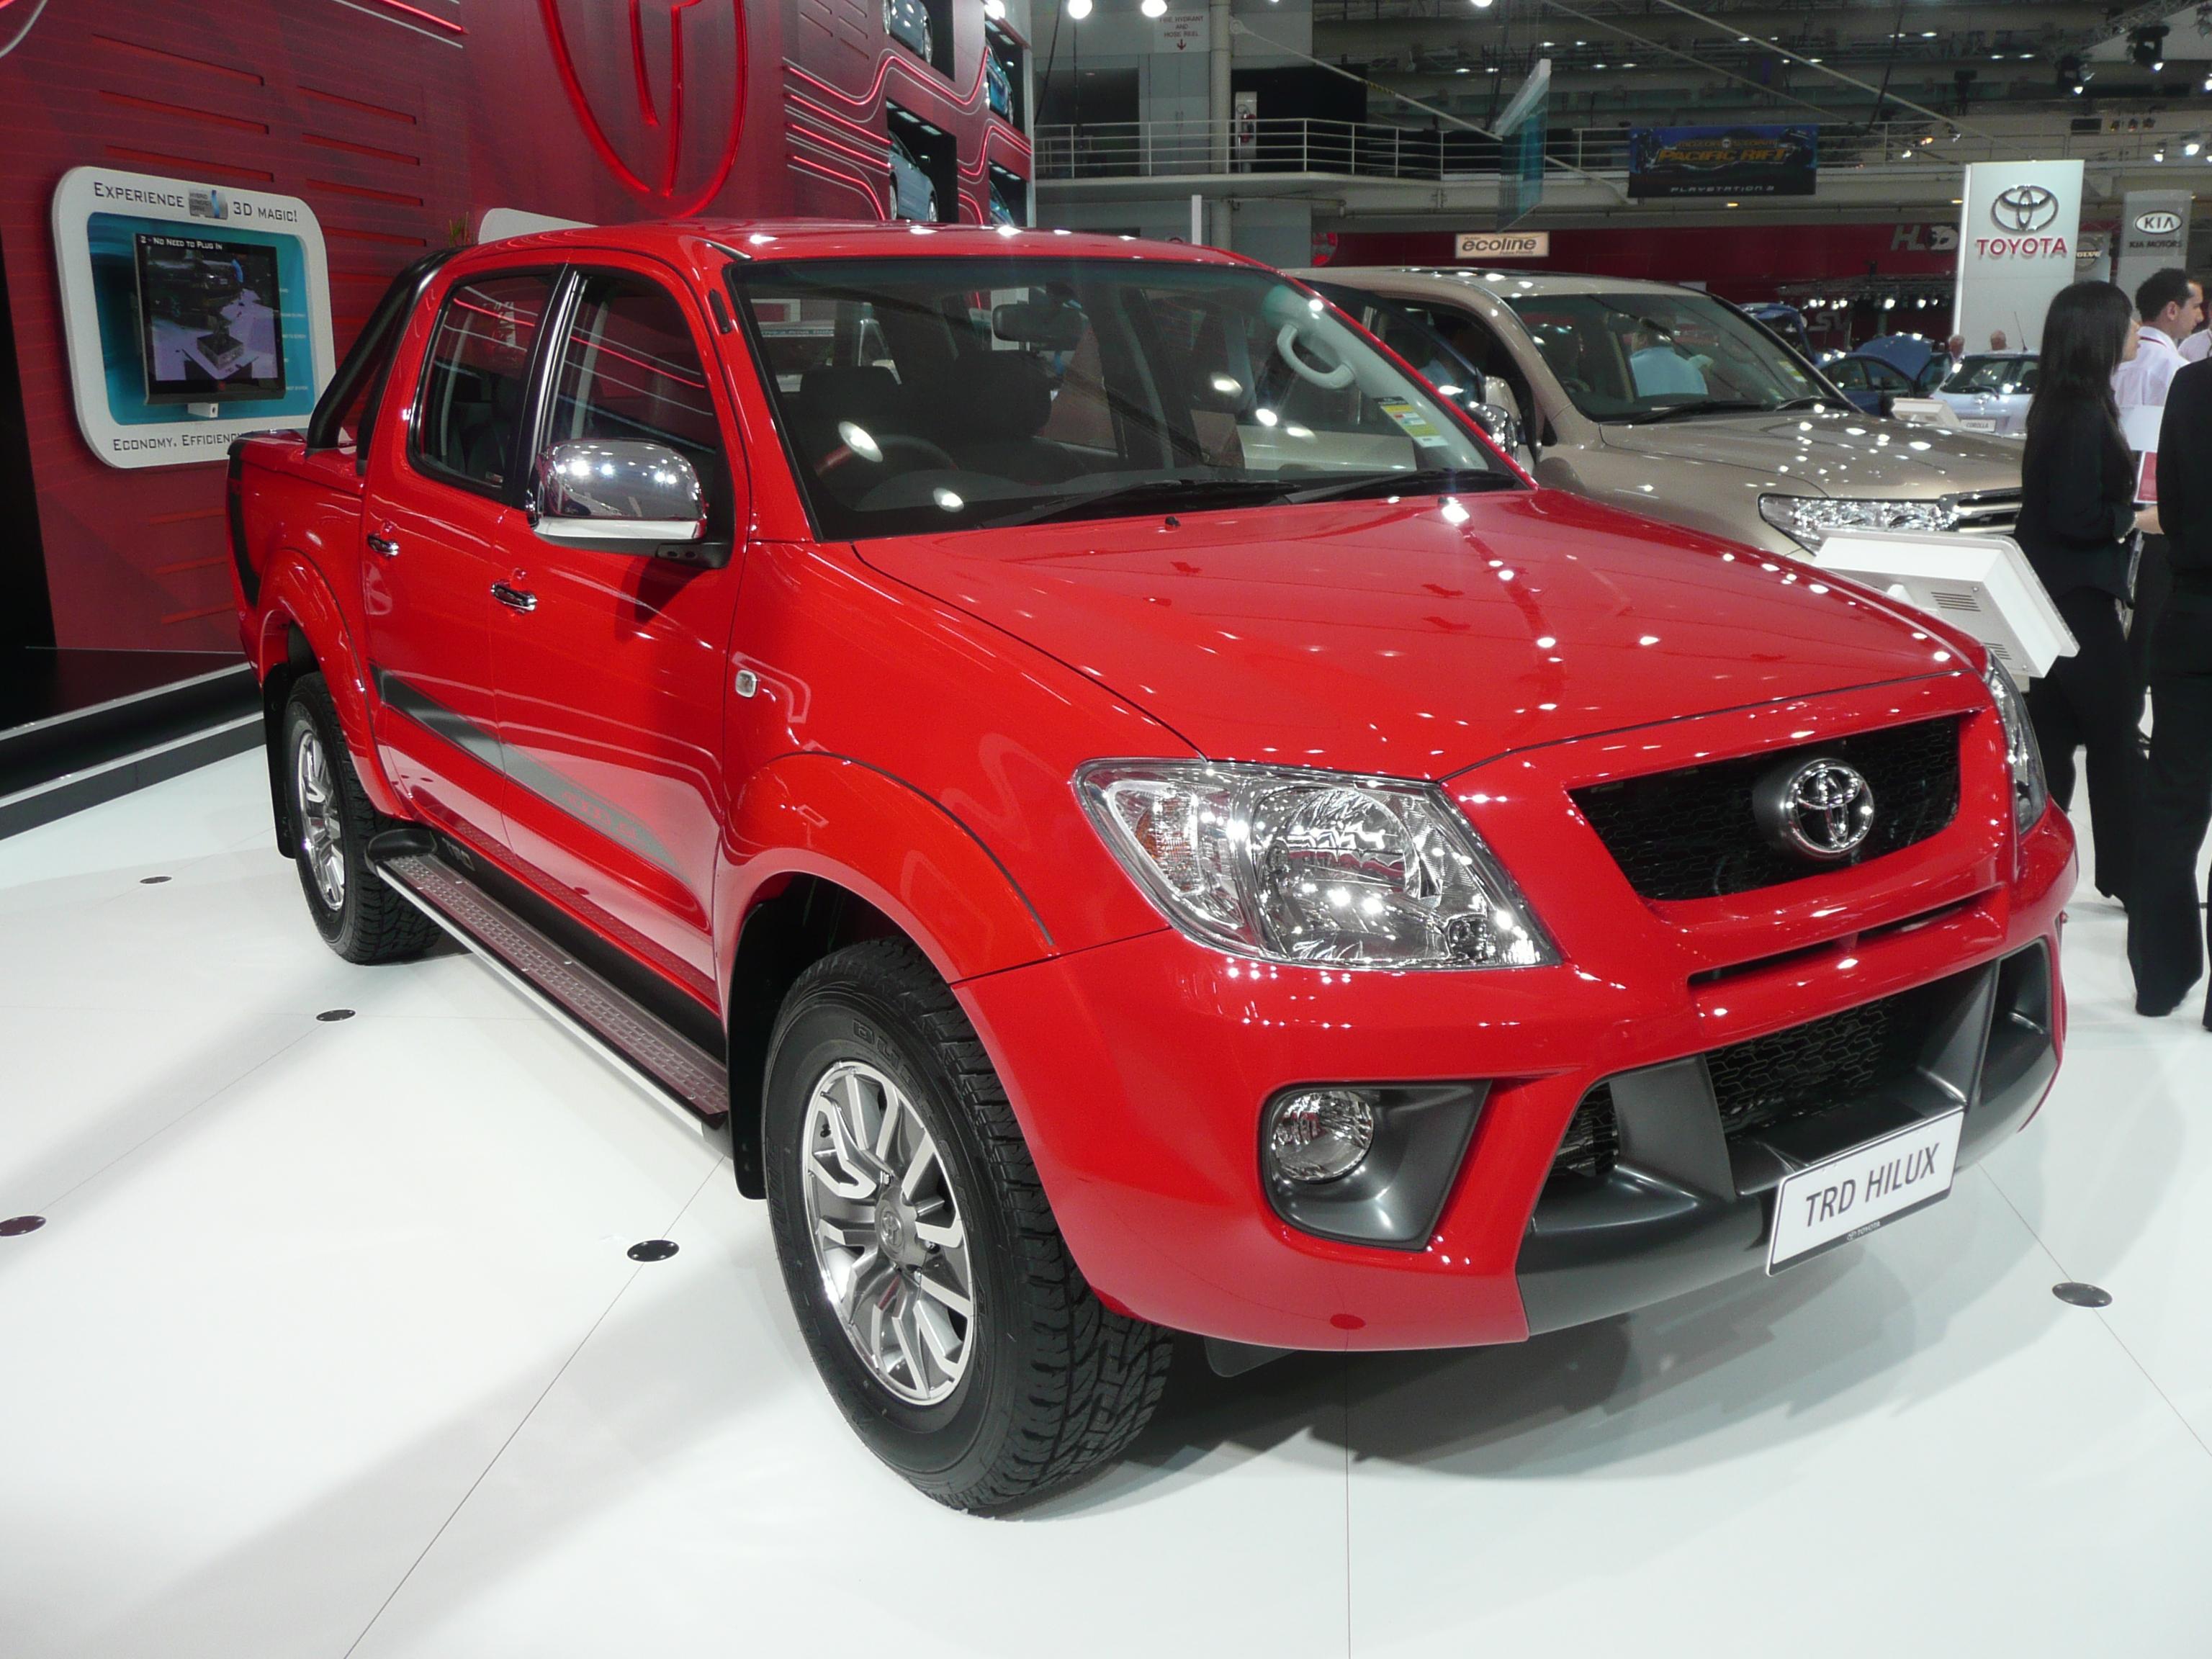 Toyota España lanza la gama 2018 de Toyota Hilux - Worldnews.com